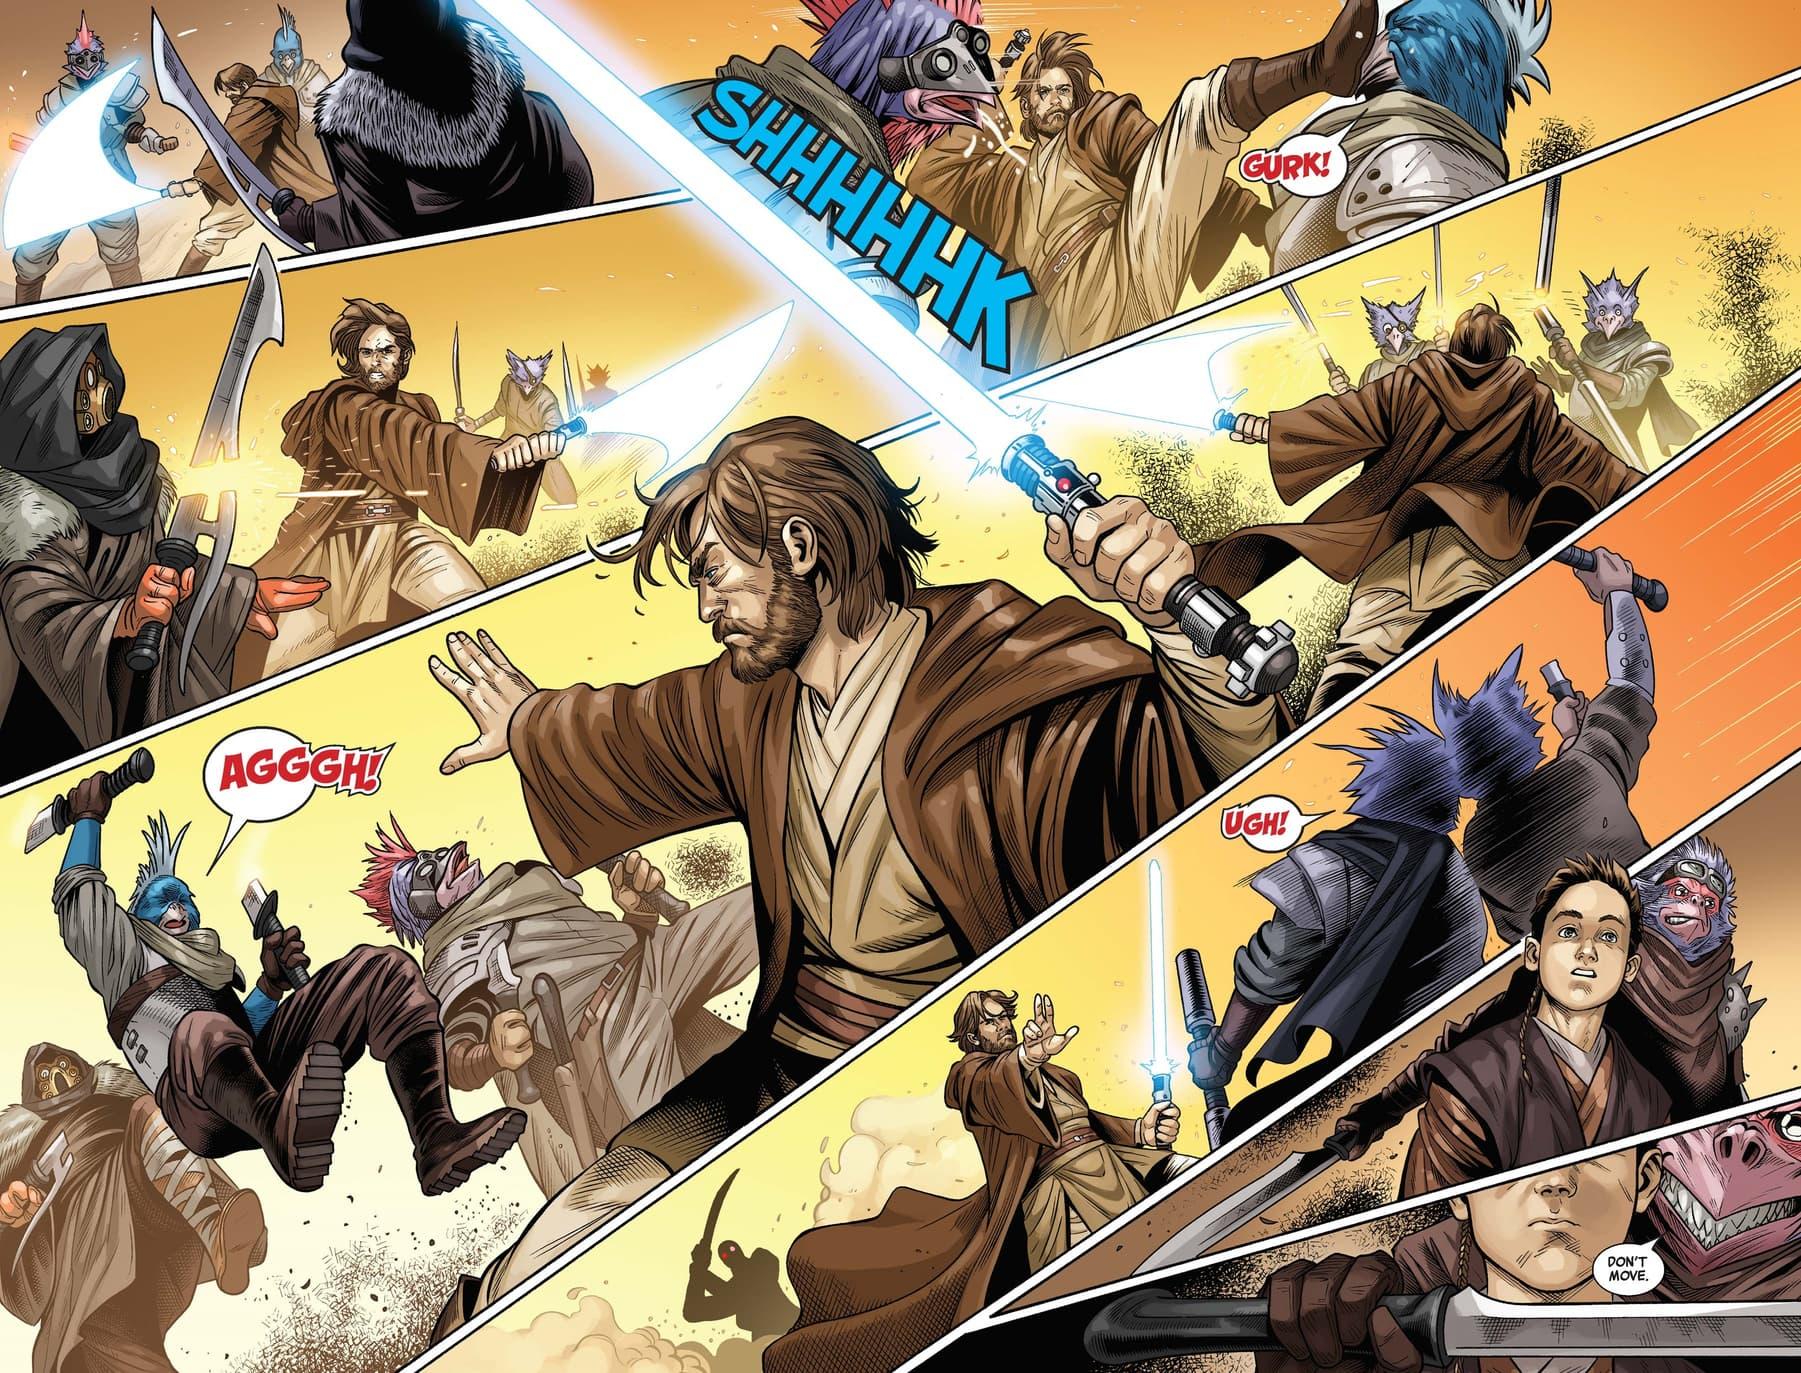 Anakin watches Obi-Wan wield the Force like a total pro.